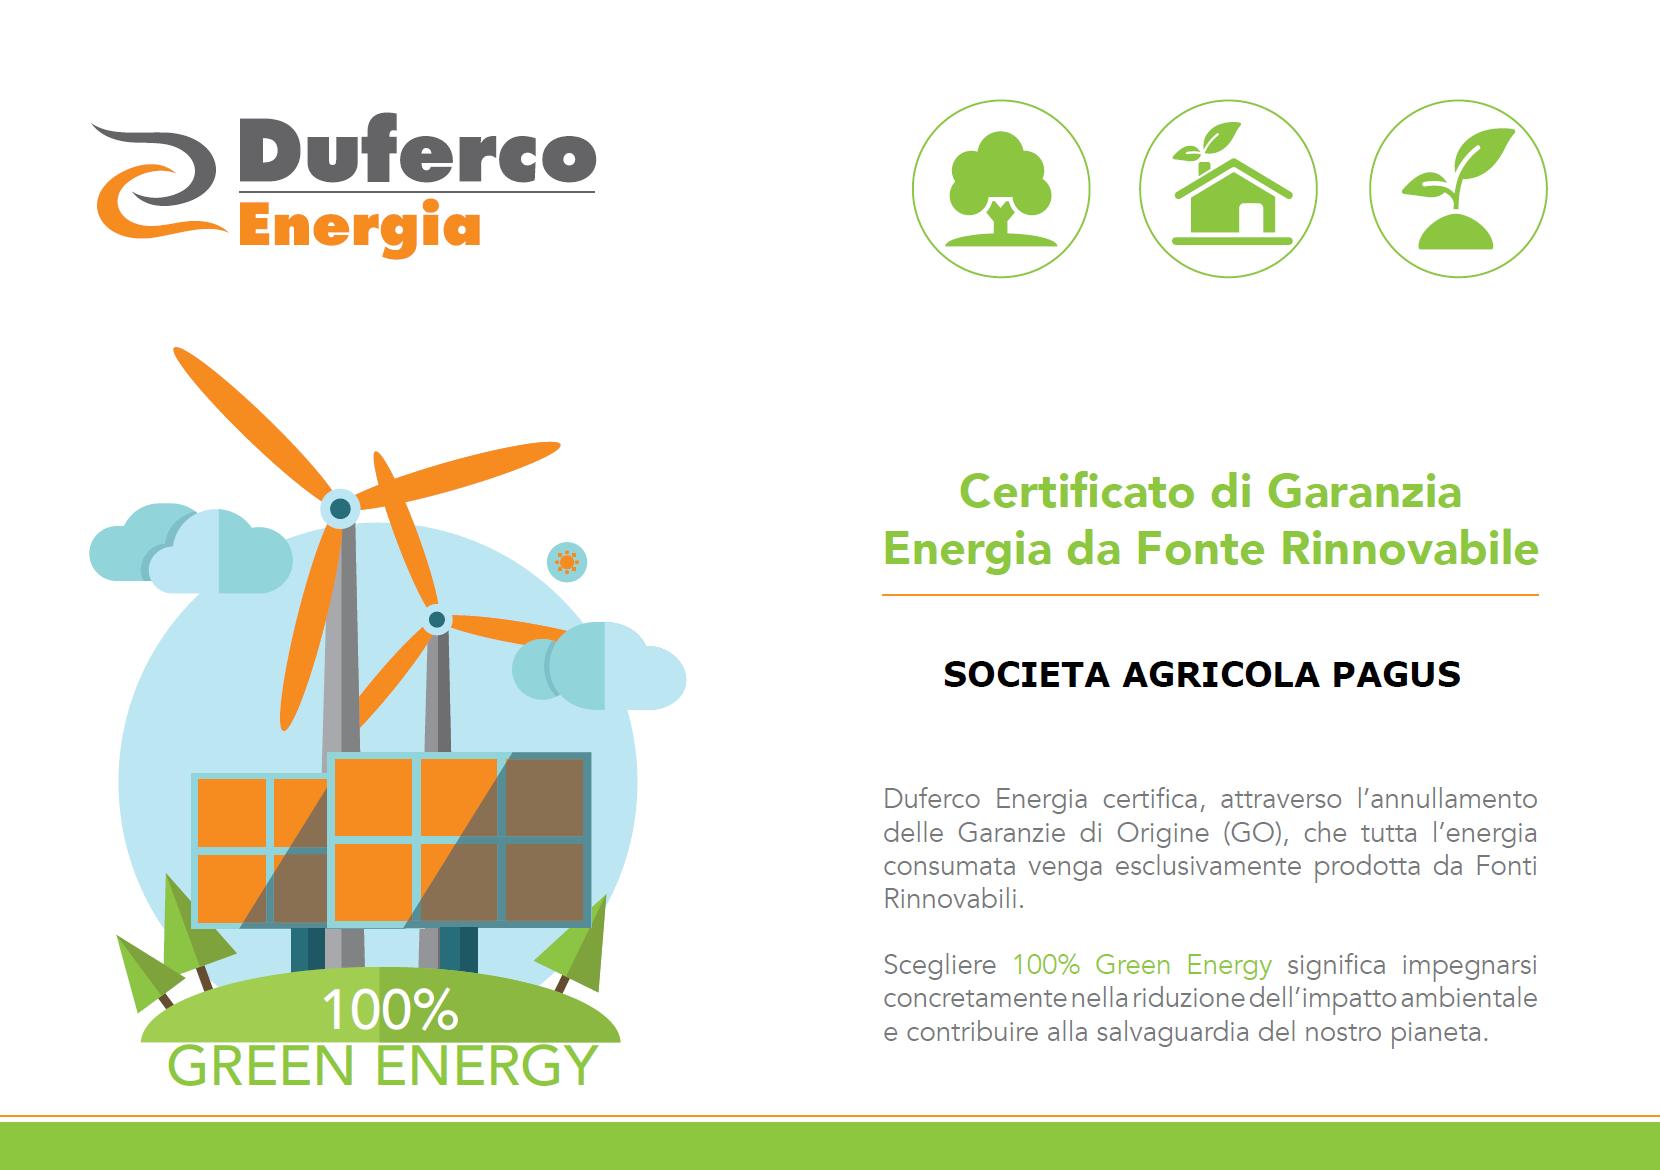 Logo Duferco energia sostenibile